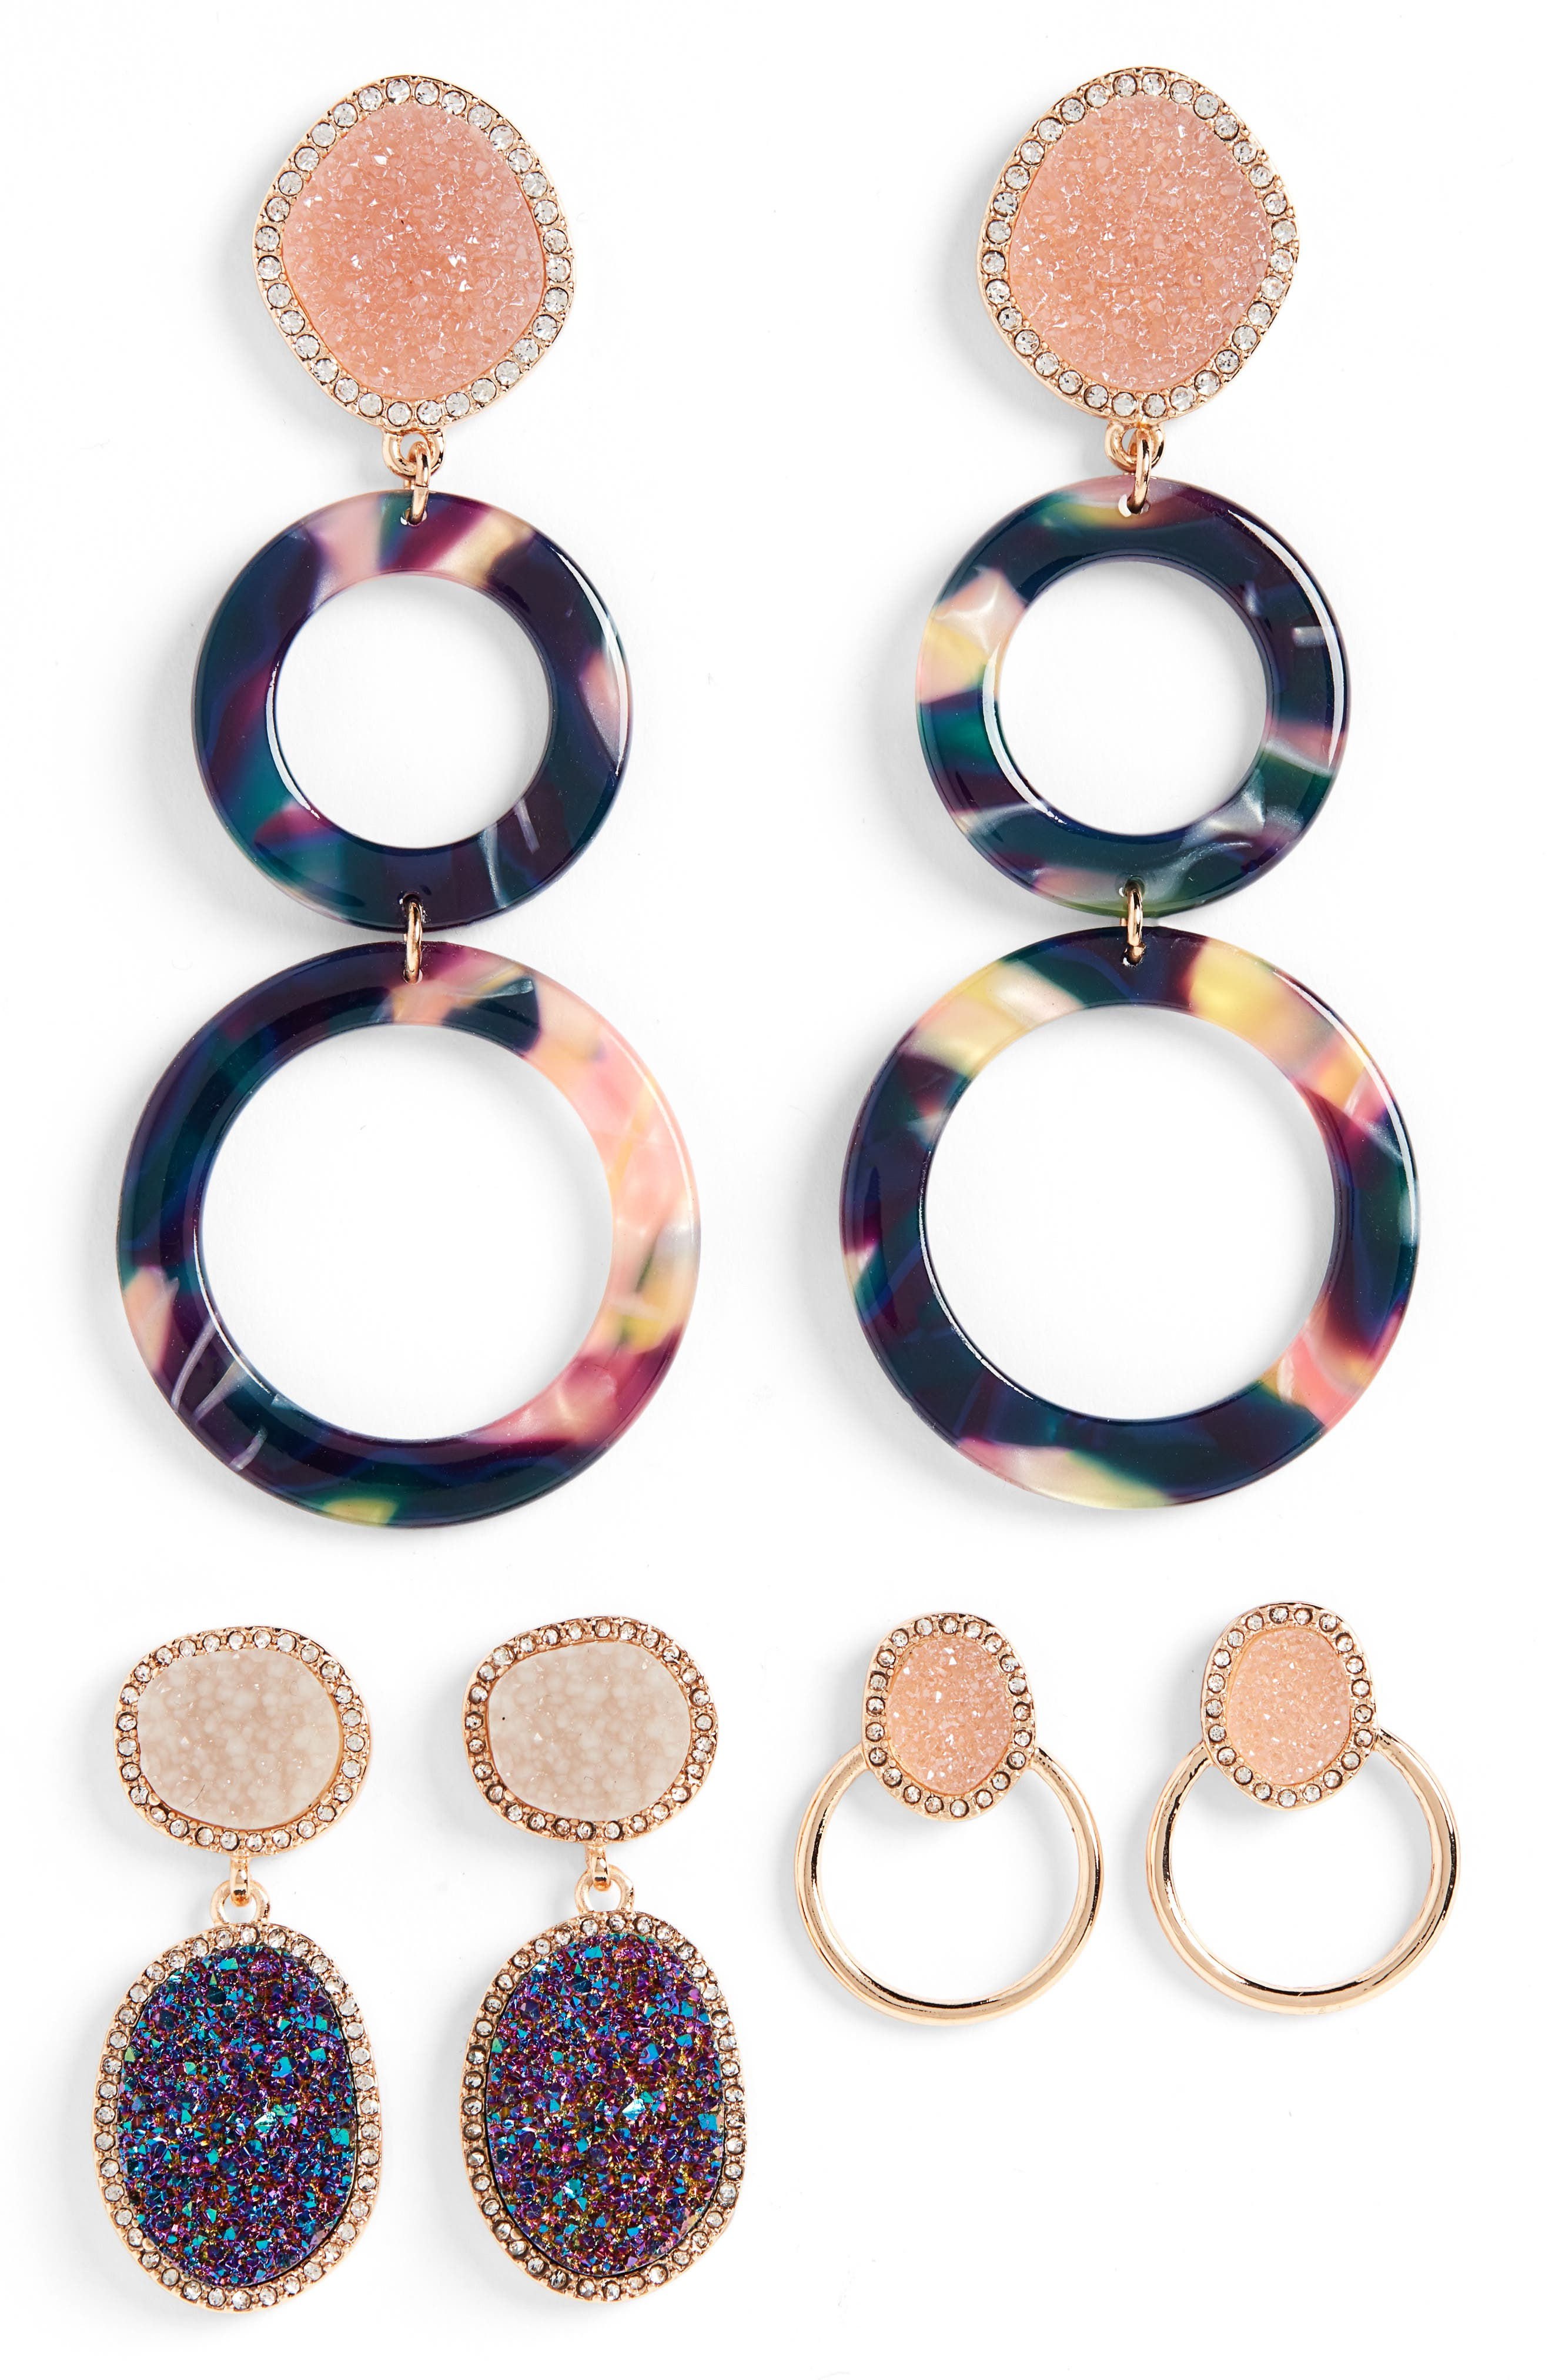 BAUBLEBAR, Set of 3 Hoop & Drop Earrings, Main thumbnail 1, color, 650